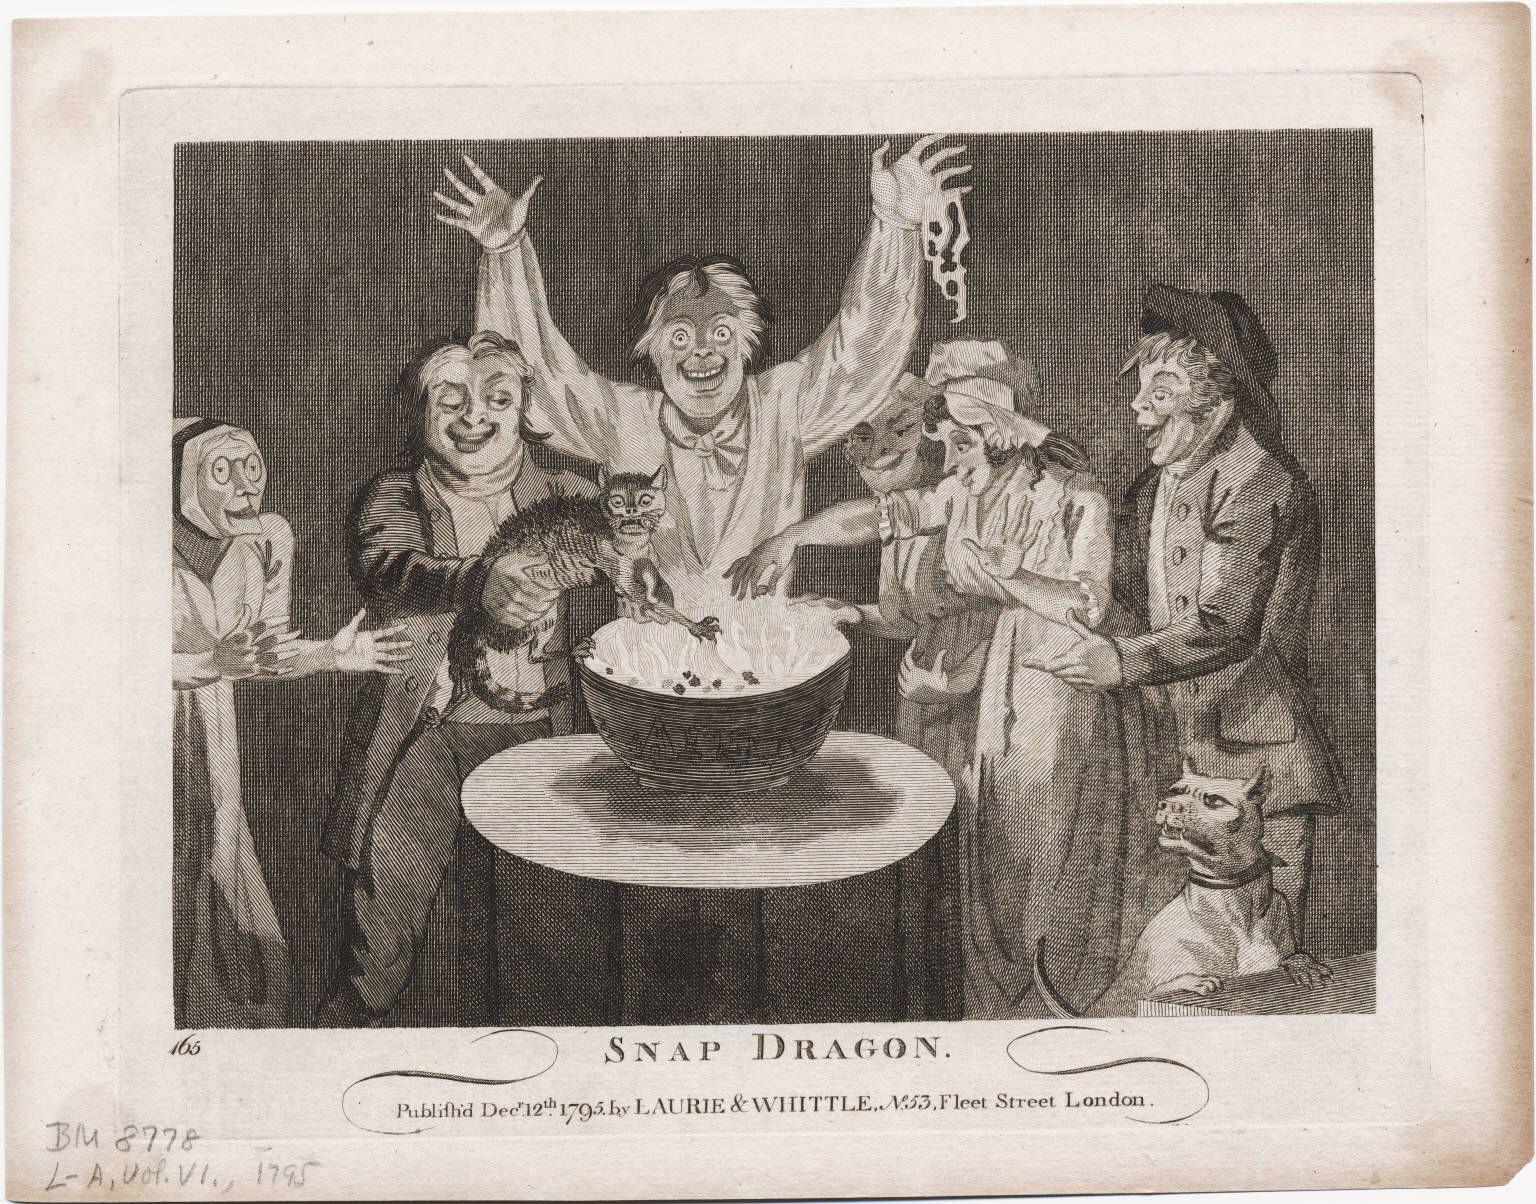 1795 December 12th Snap Dragon By Isaac Cruikshank Game